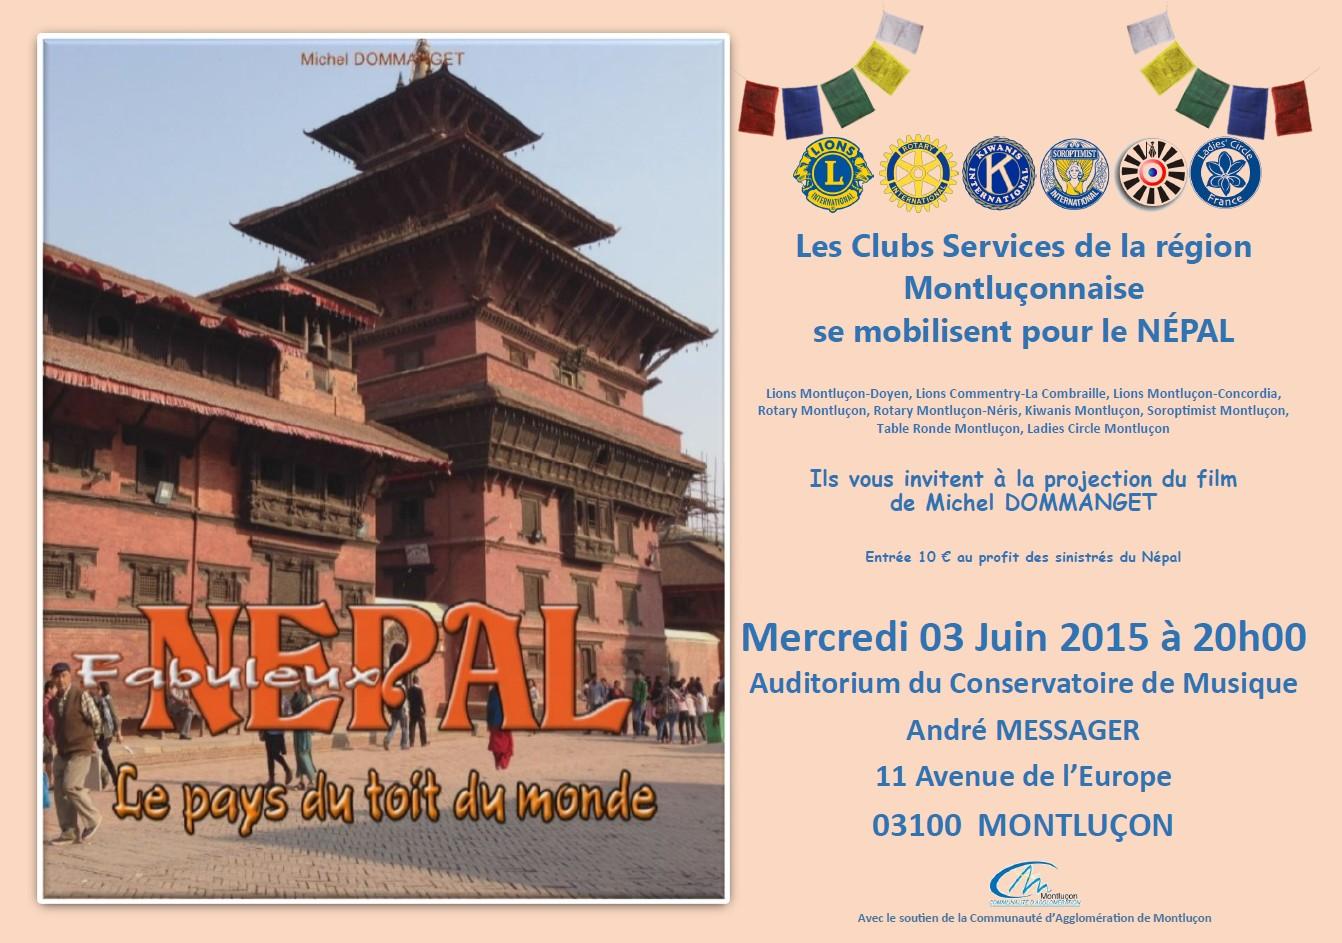 http://www.google.fr/url?source=imglanding&ct=img&q=http://cdt03.media.tourinsoft.eu/upload/Nepal.jpg&sa=X&ei=N3psVZekF8O6UZrYgagP&ved=0CAkQ8wc4Gw&usg=AFQjCNExsay-mbDGc063QPi8GteUw6L9-Q